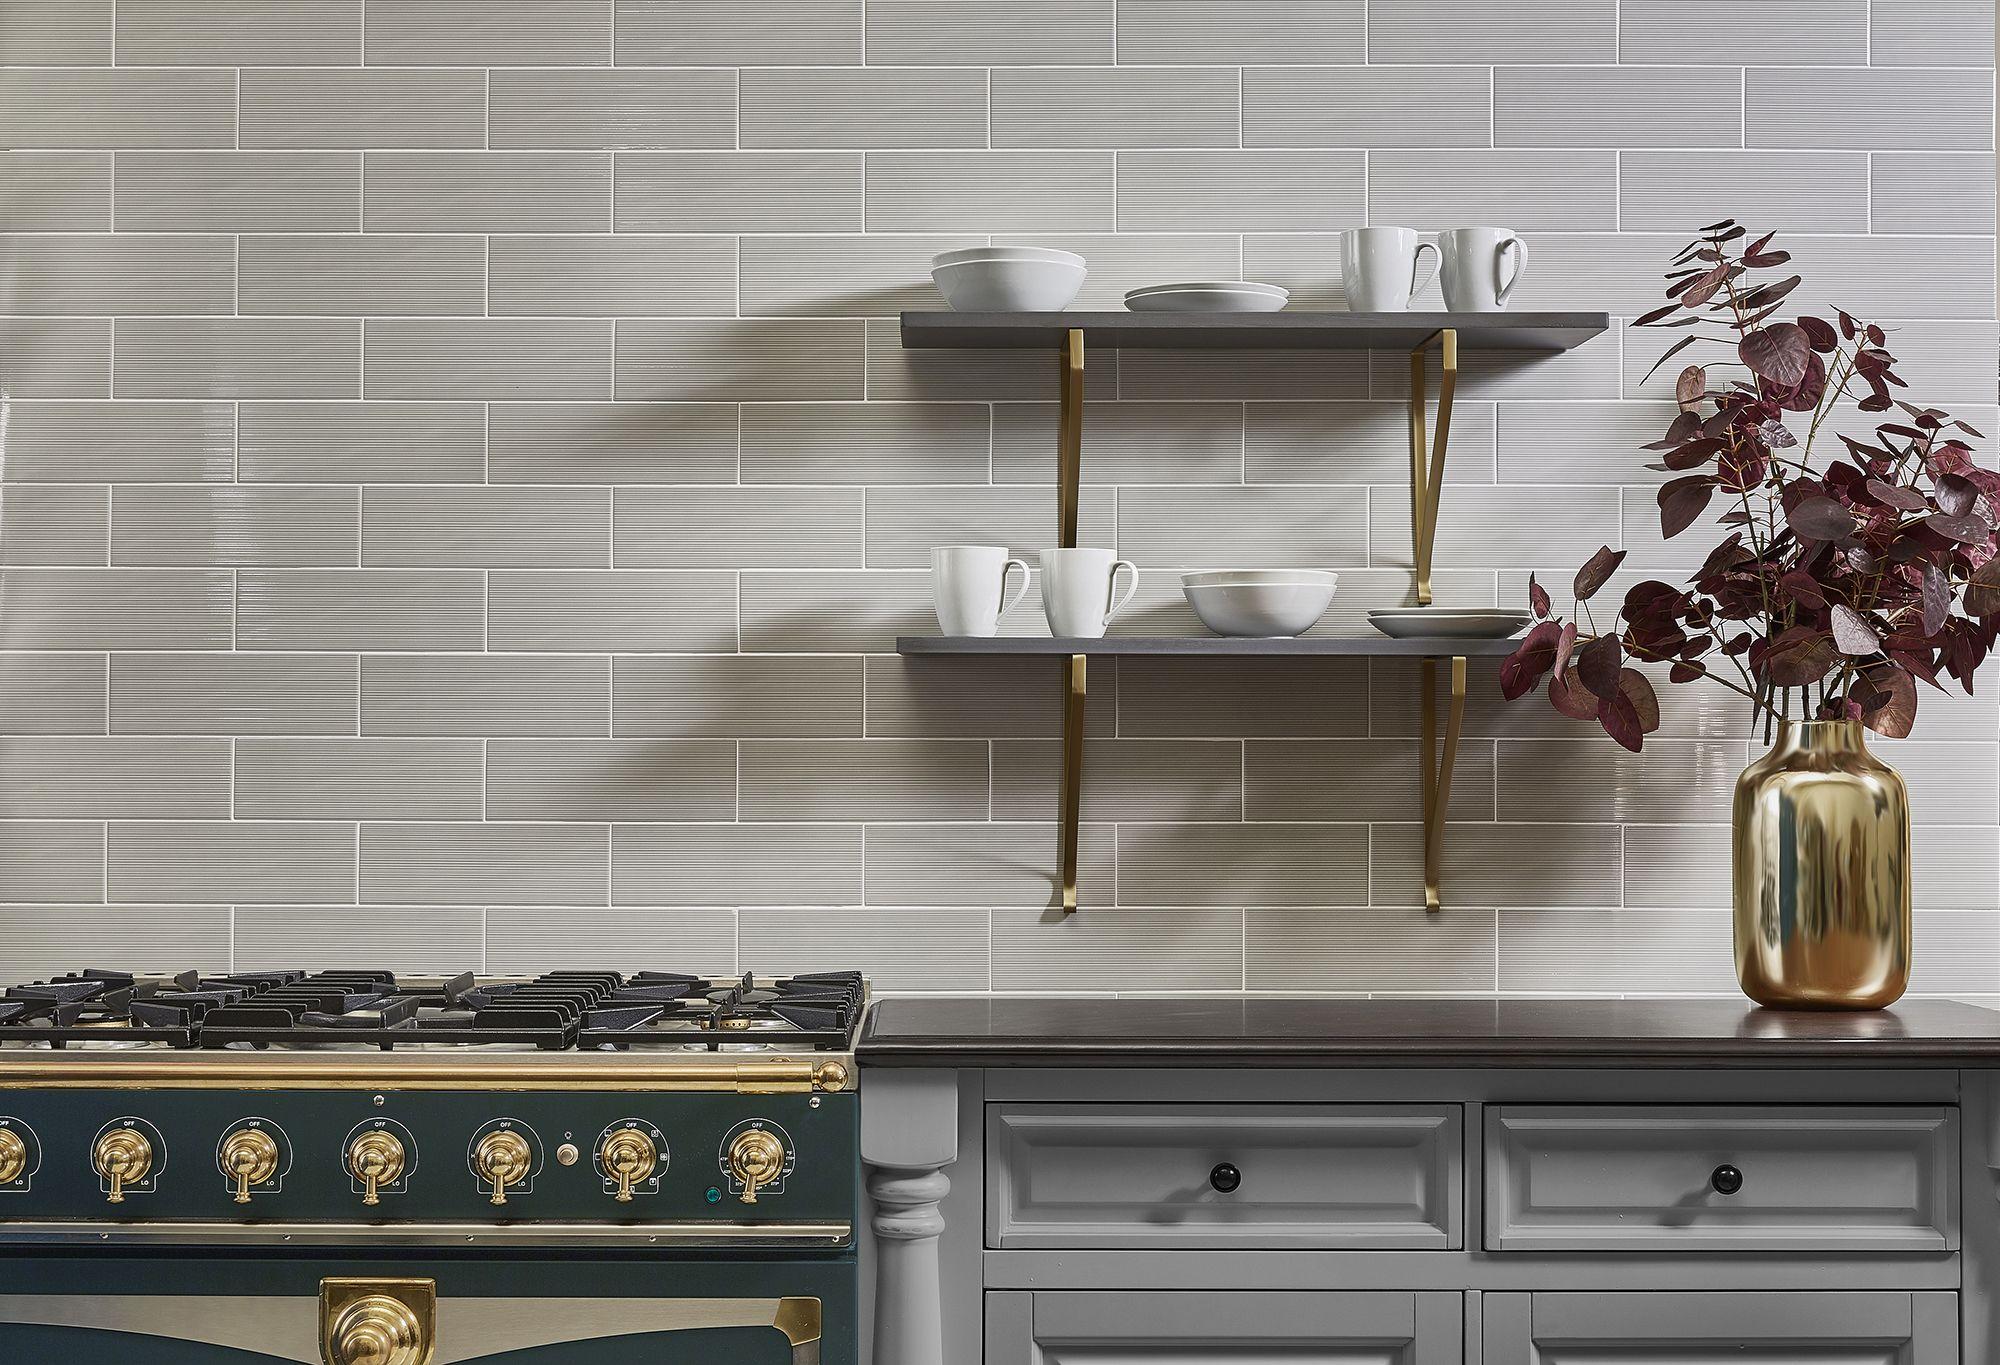 Akdo Tile In Impressions Combed In Spring Rain Grey Tile Textured Tile Kitchen Backsplash Akdo Tile Akdo Kitchen Tiles